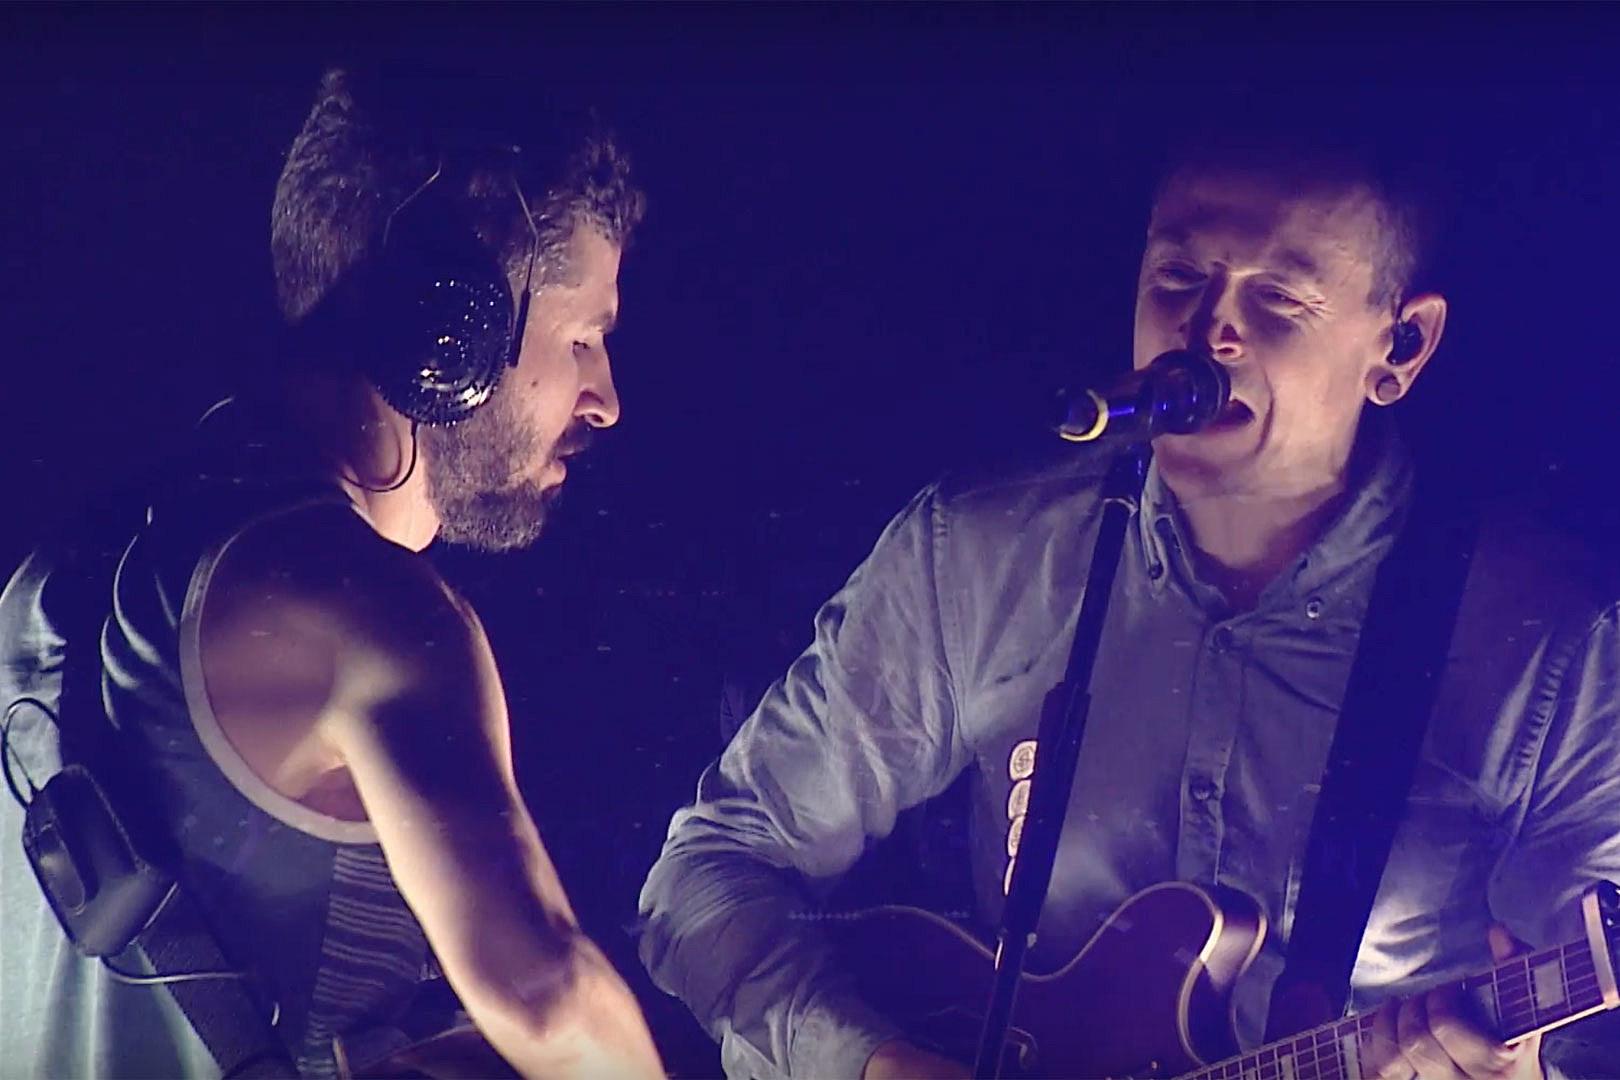 Linkin Park Release Live Performance Video for 'Sharp Edges'